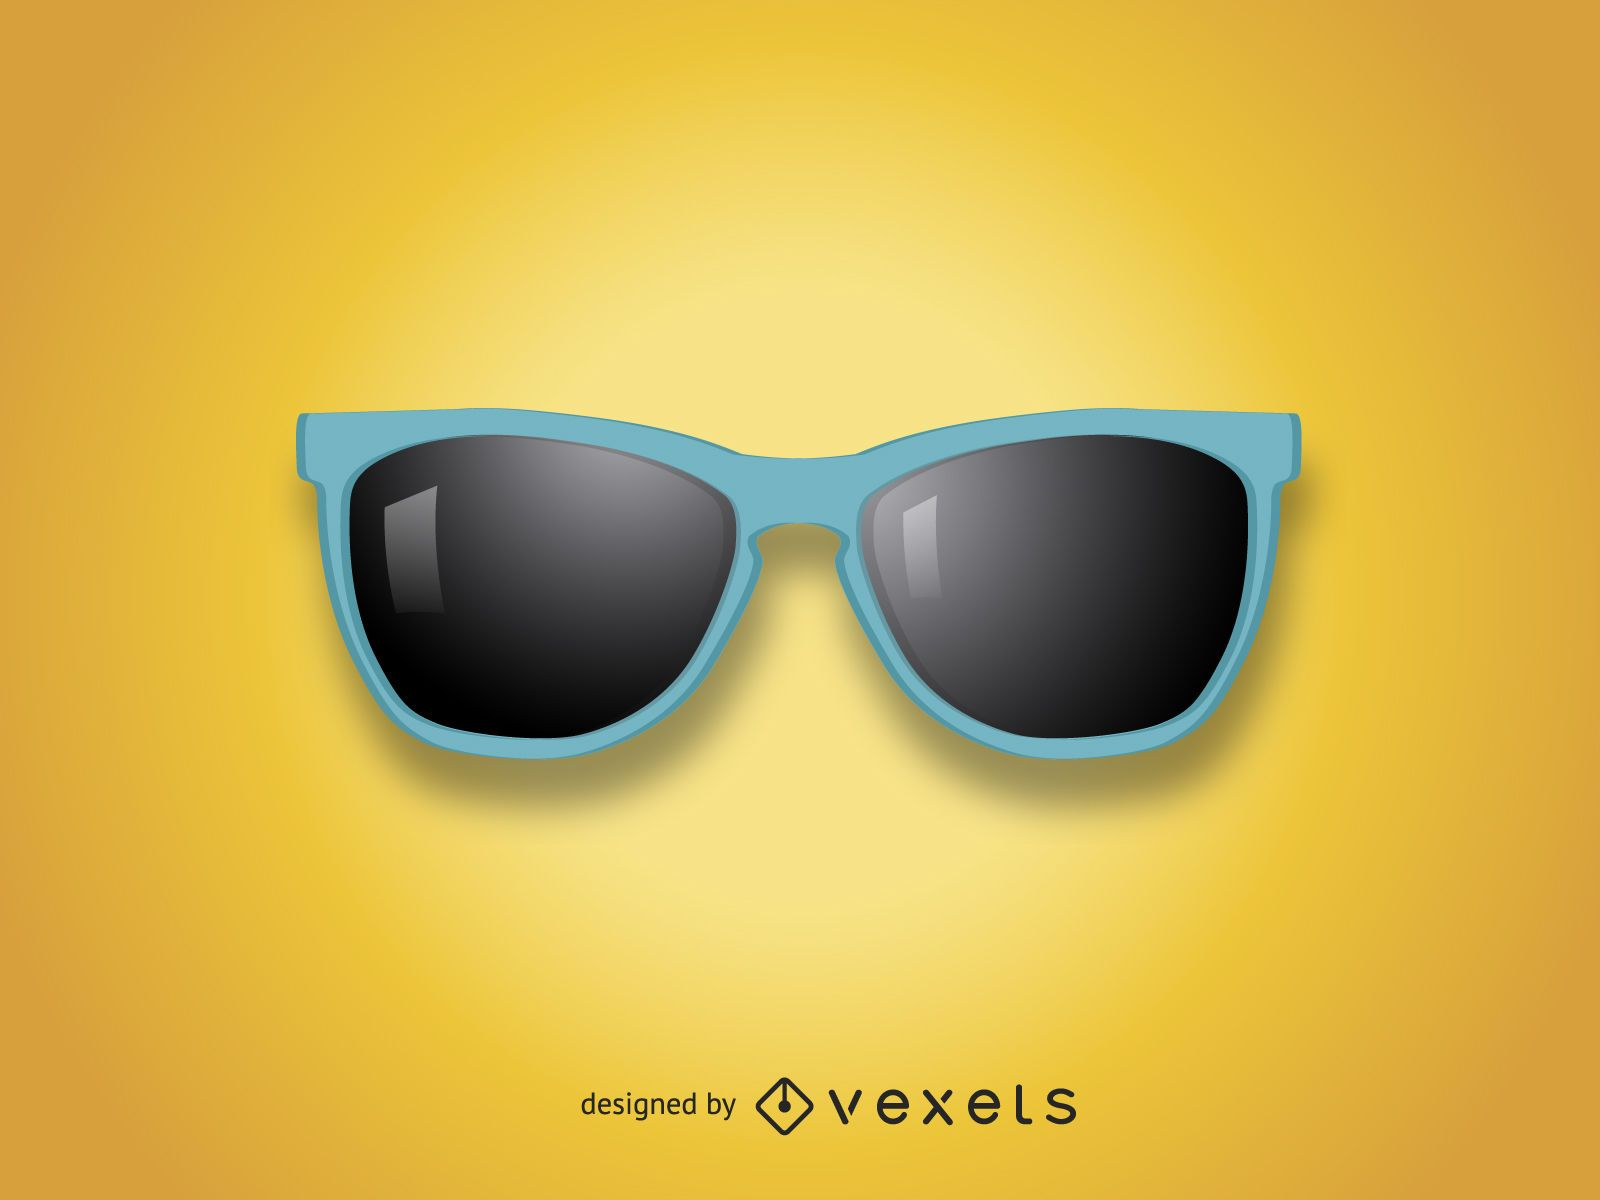 Realistic sunglasses illustration